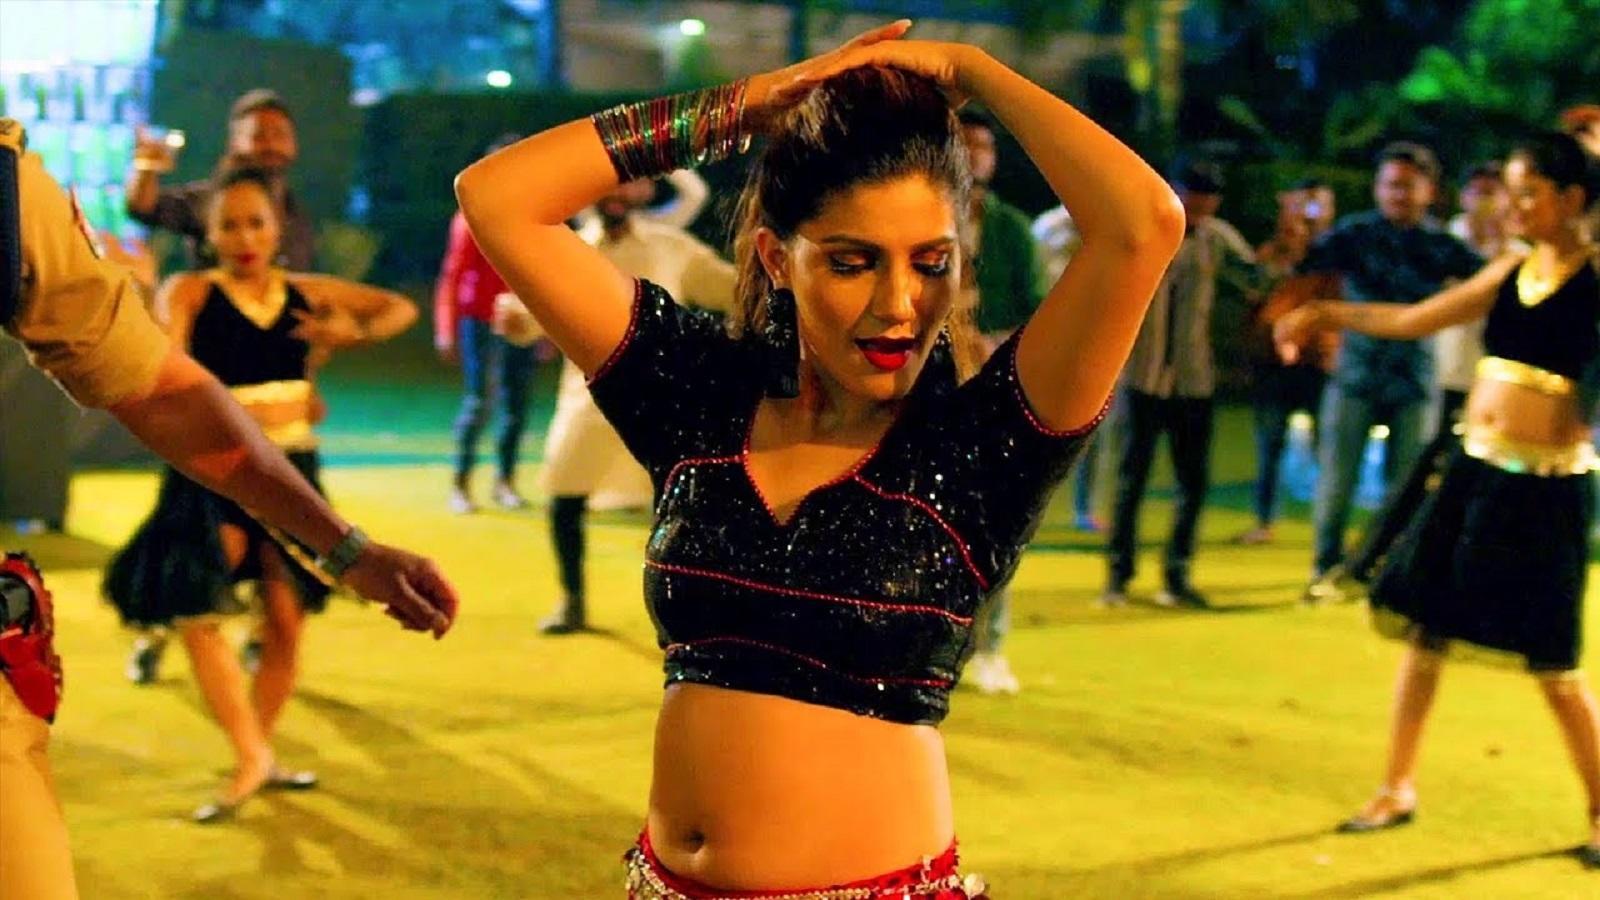 Watch: Sapna Choudhary's latest Haryanvi Song 'Thumka' sung by Annu Kadyan